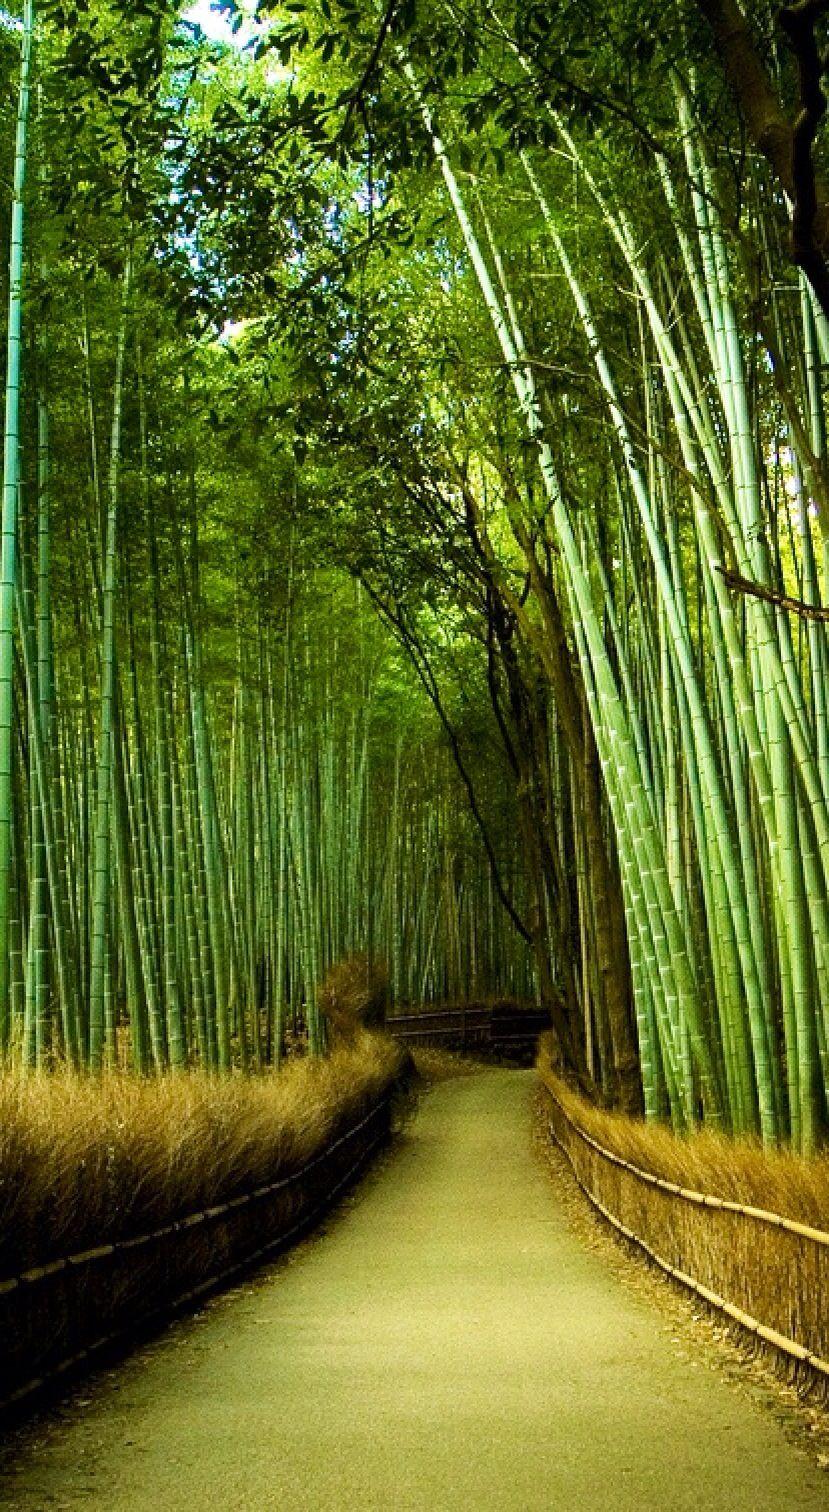 bamboo garden kyoto nature 39 s beauty pinterest. Black Bedroom Furniture Sets. Home Design Ideas